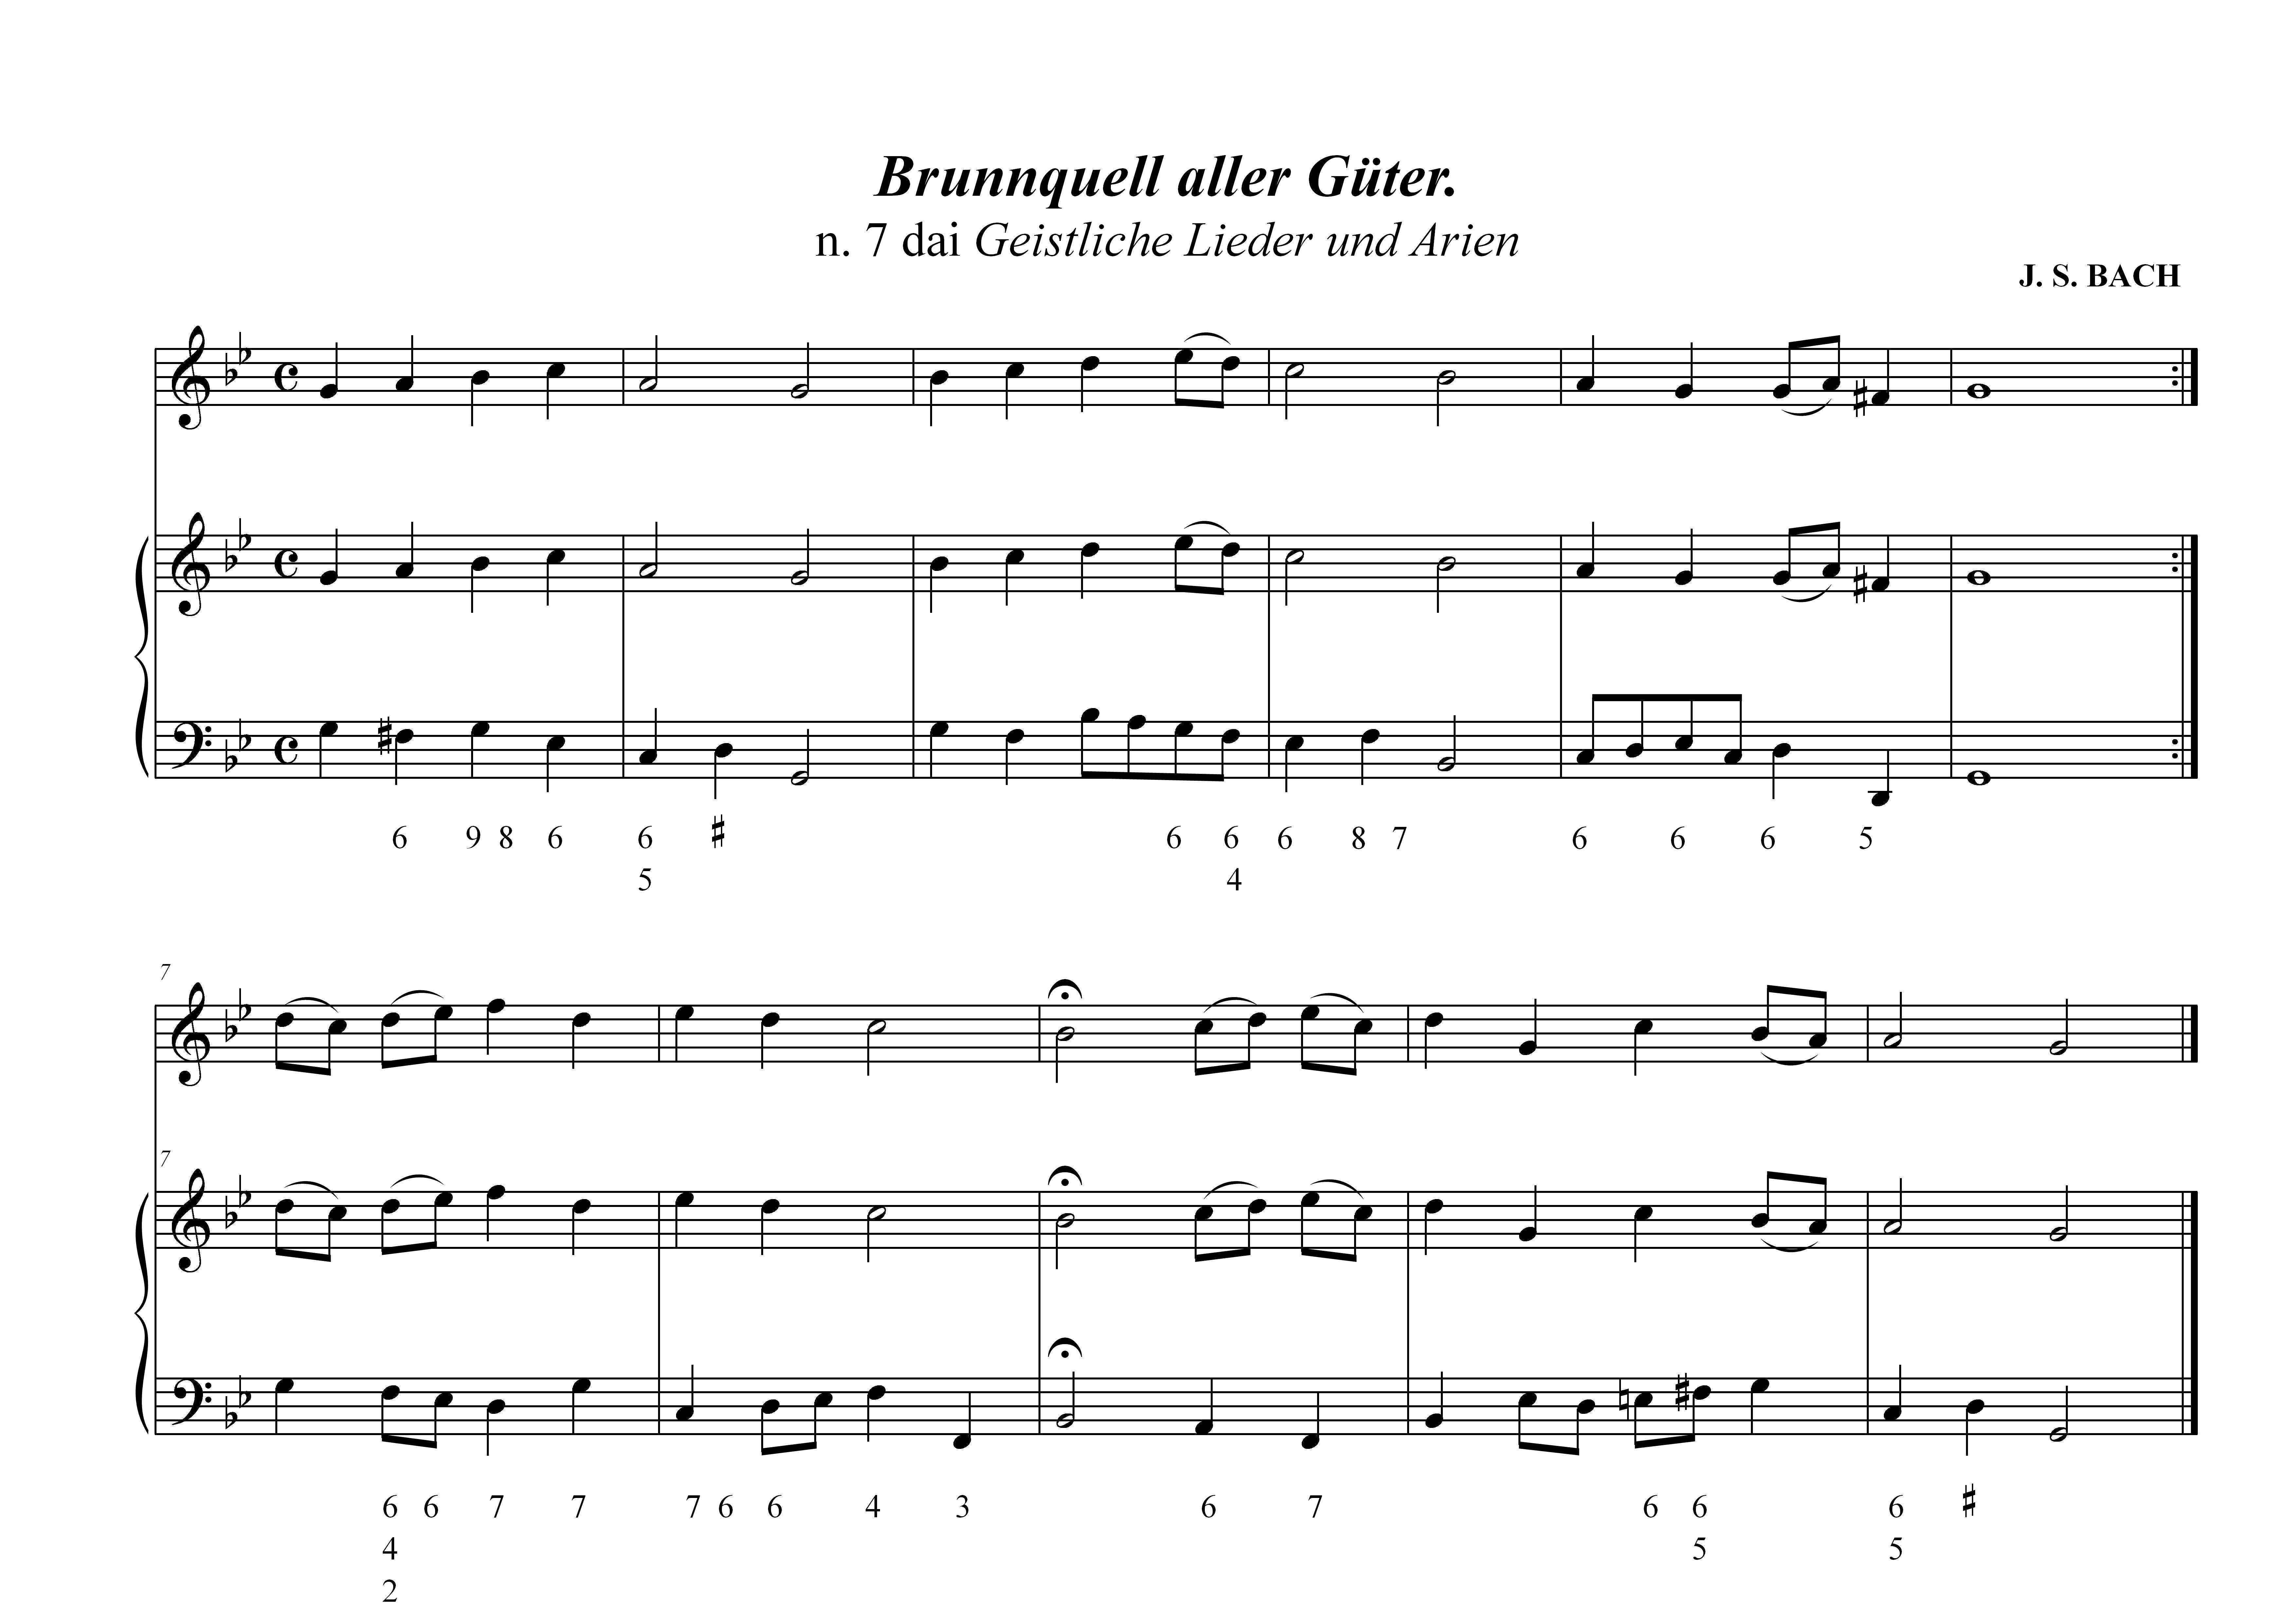 bc - Bach n. 7  Canti sacri - II fase (raddoppio canto).jpg